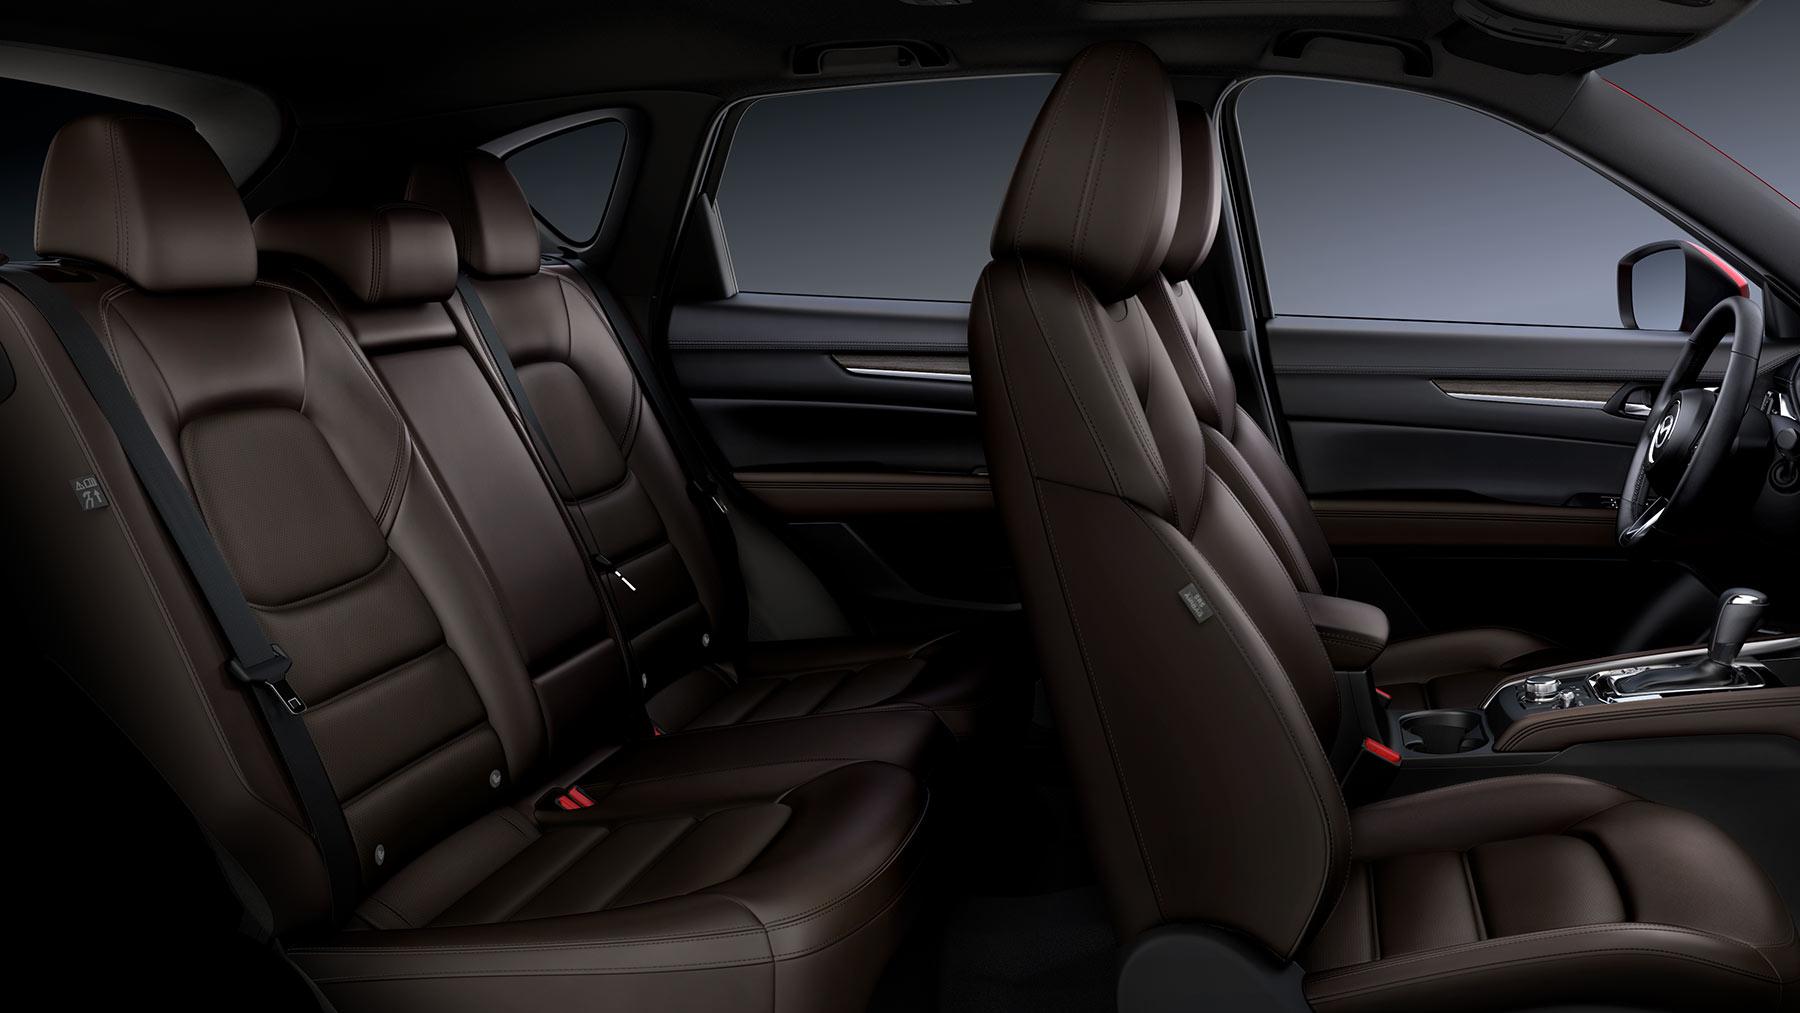 Spacious Interior of the 2019 Mazda CX-5